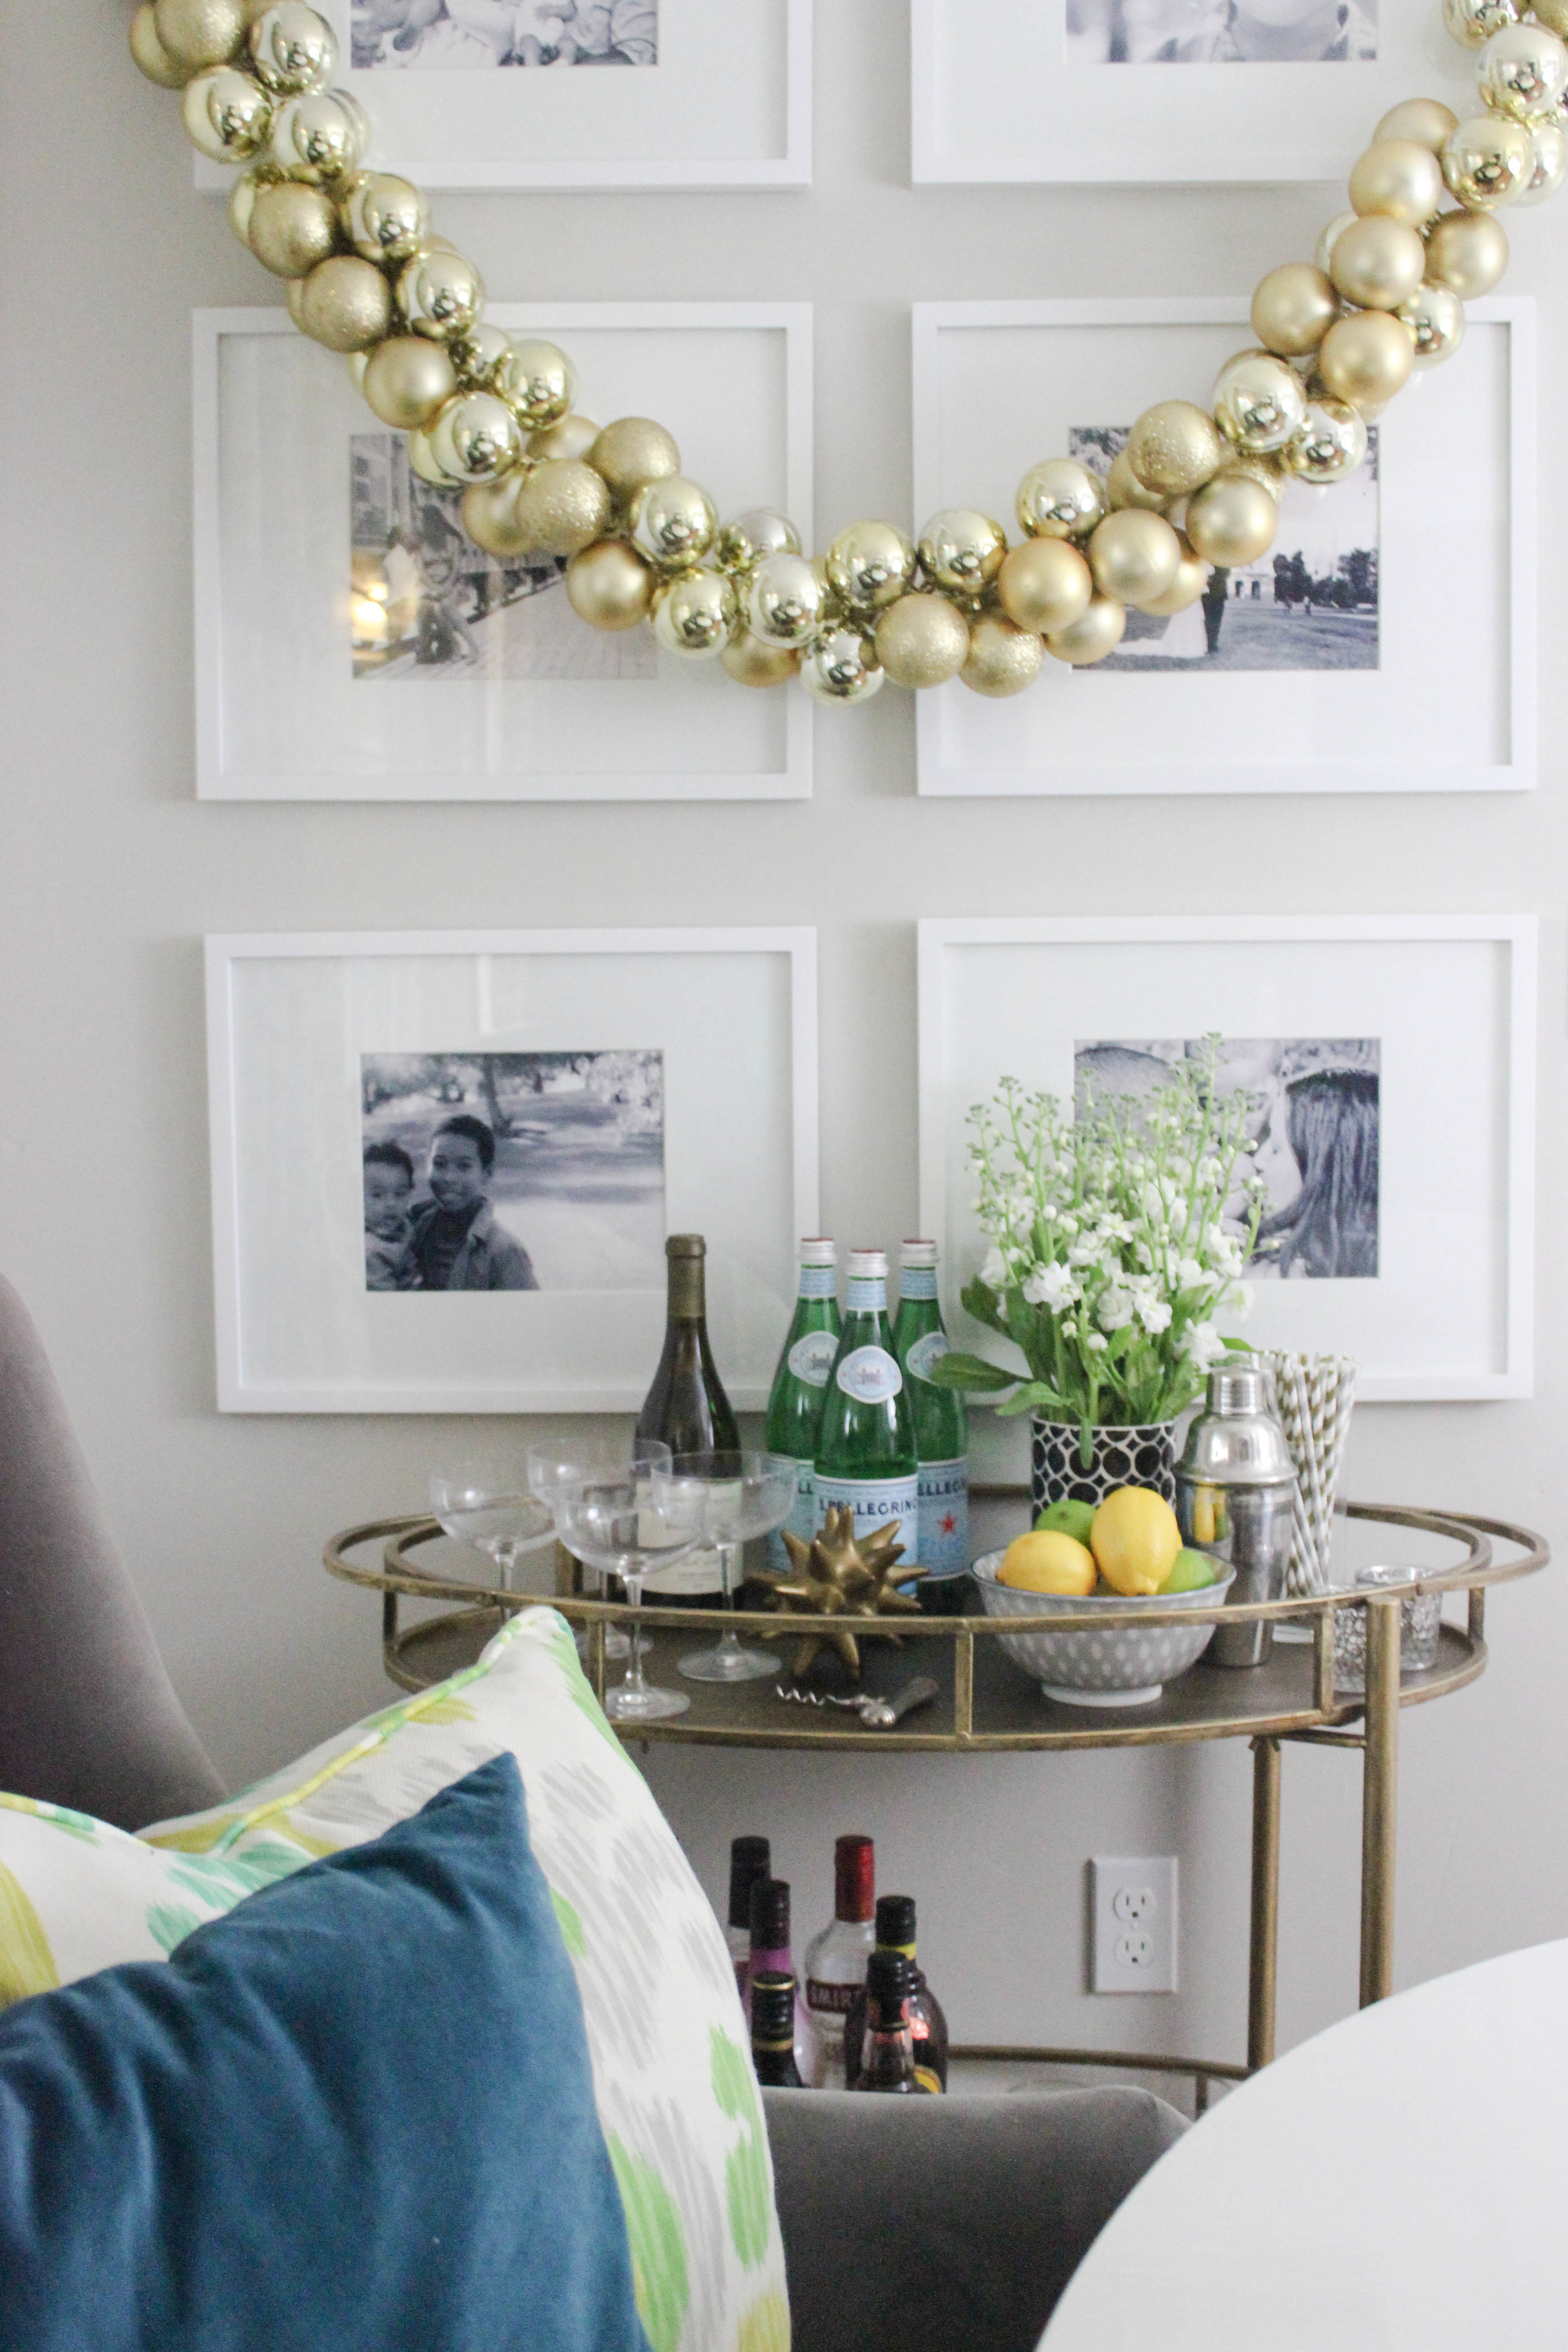 Styling A Bar Cart For Everyday Katrina Blair Interior Design Small Home Style Modern Livingkatrina Blair